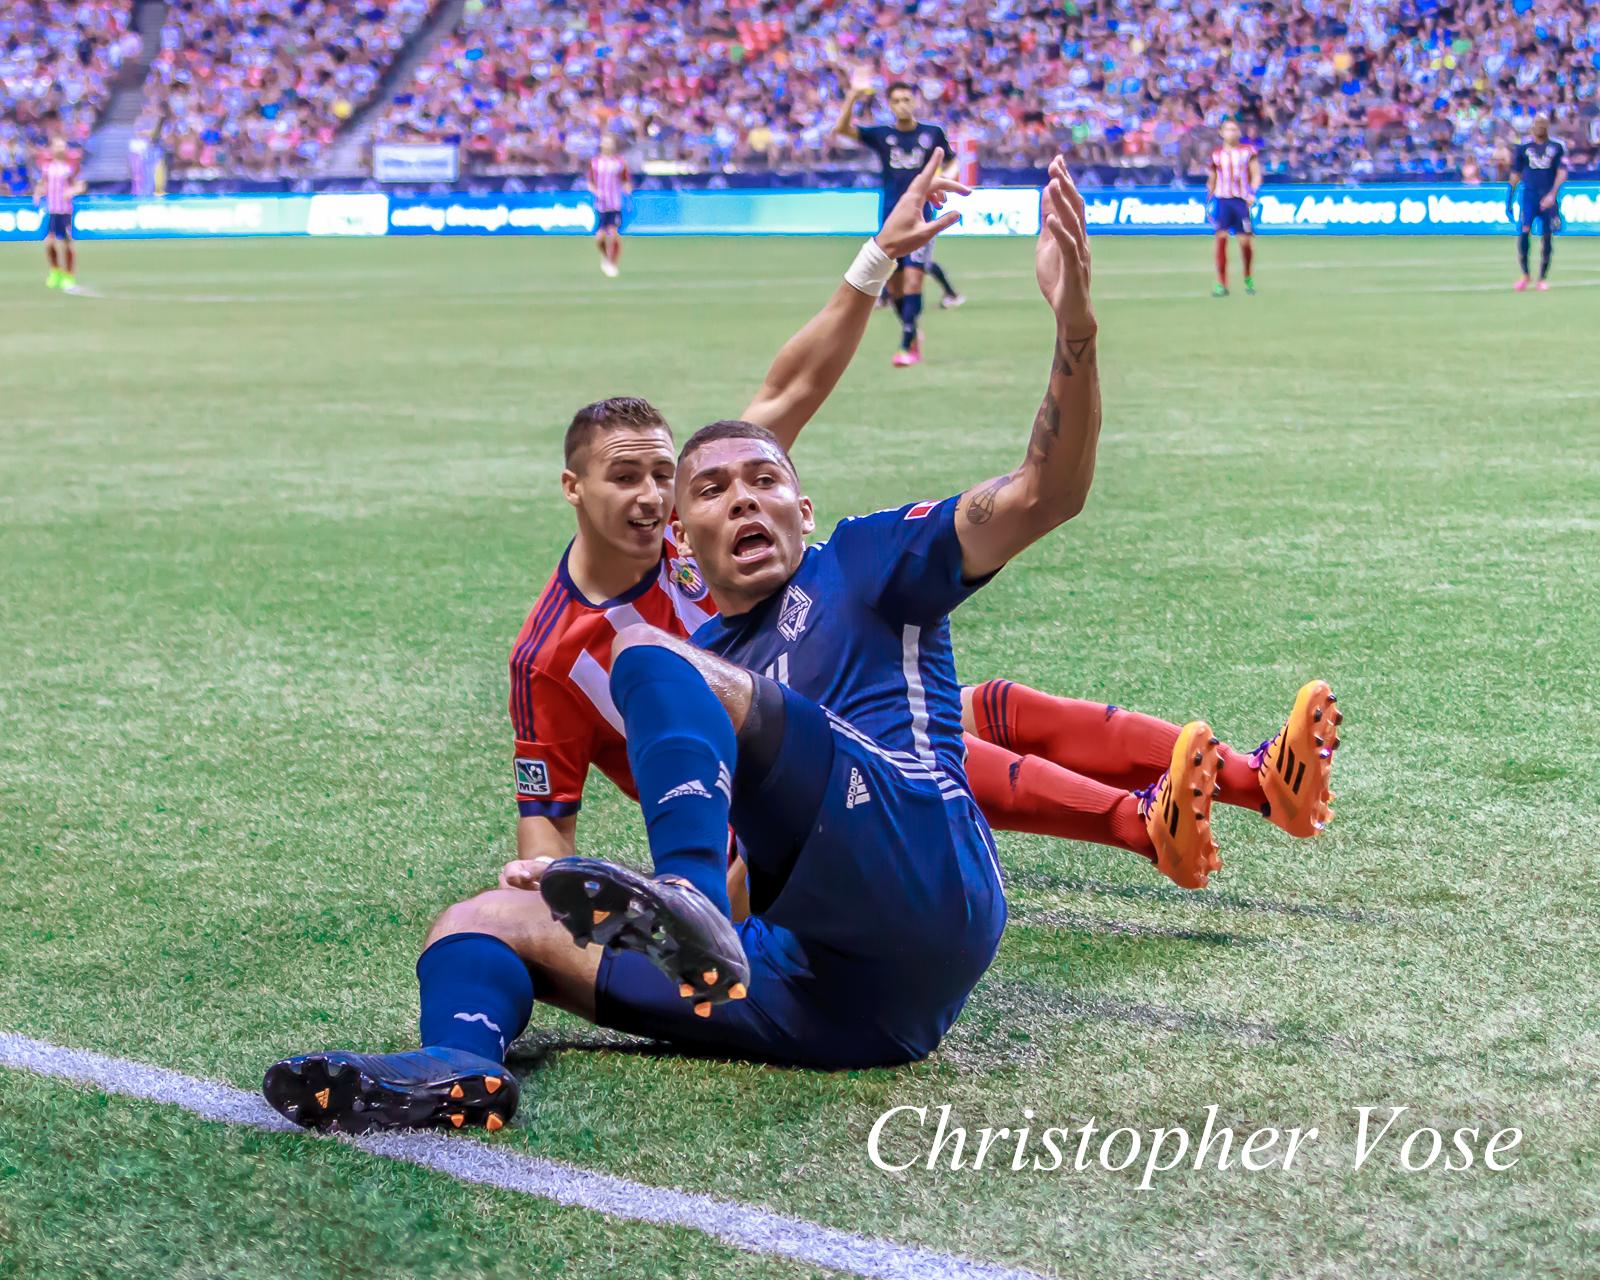 2014-07-12 Lenadro Barrera and Christian Dean.jpg